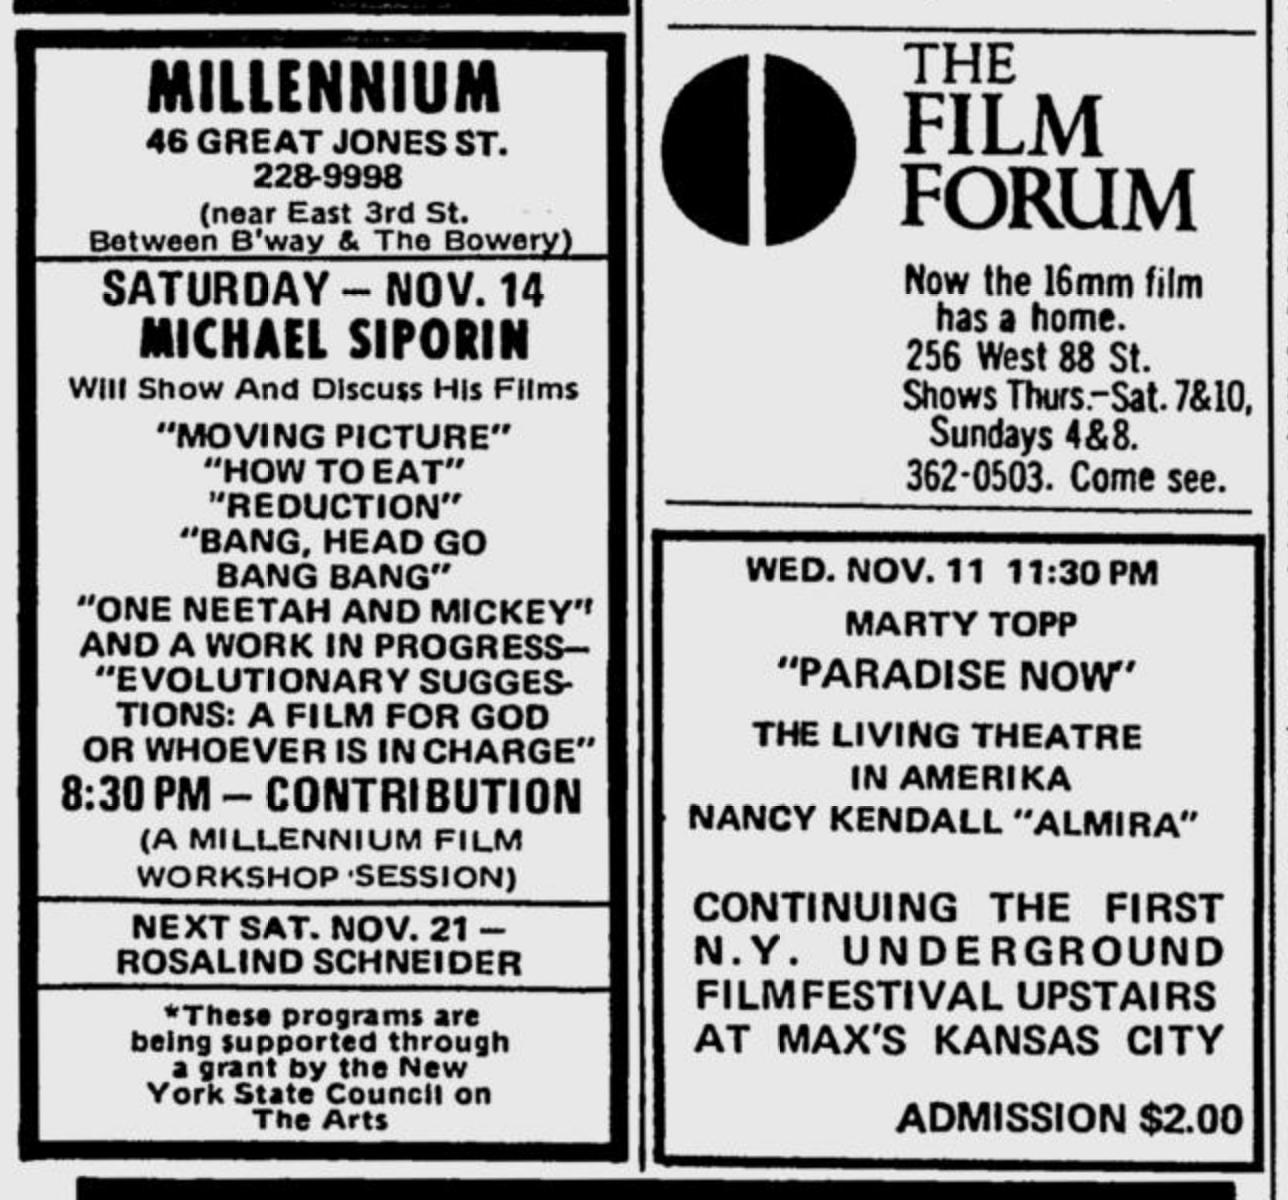 Village Voice ad for New York Underground Film Festival continuing on November 11, 1970